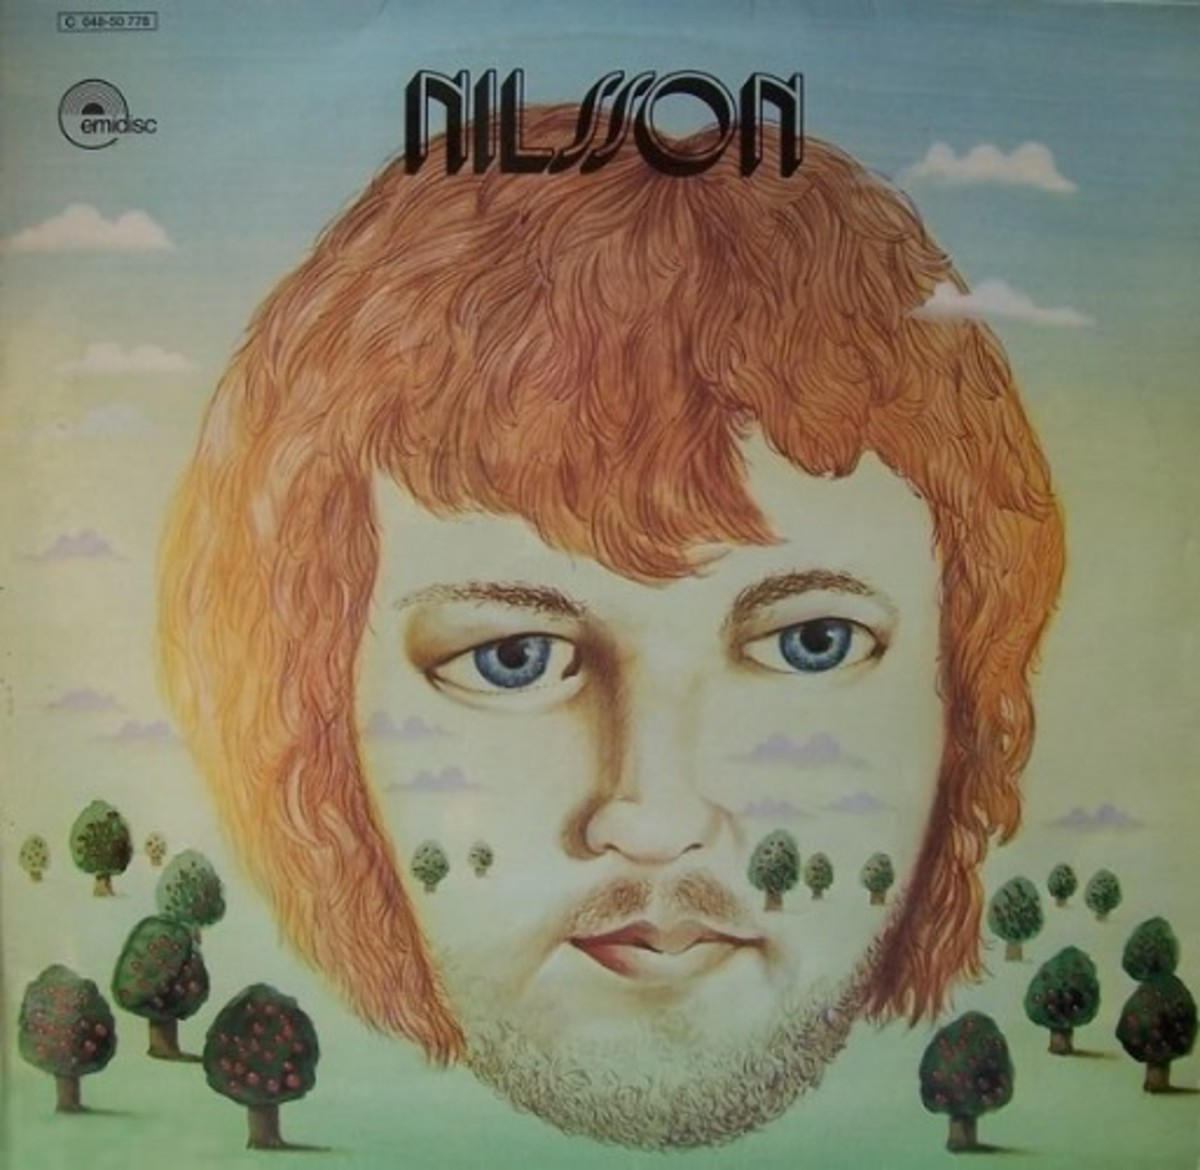 Nilsson(500)